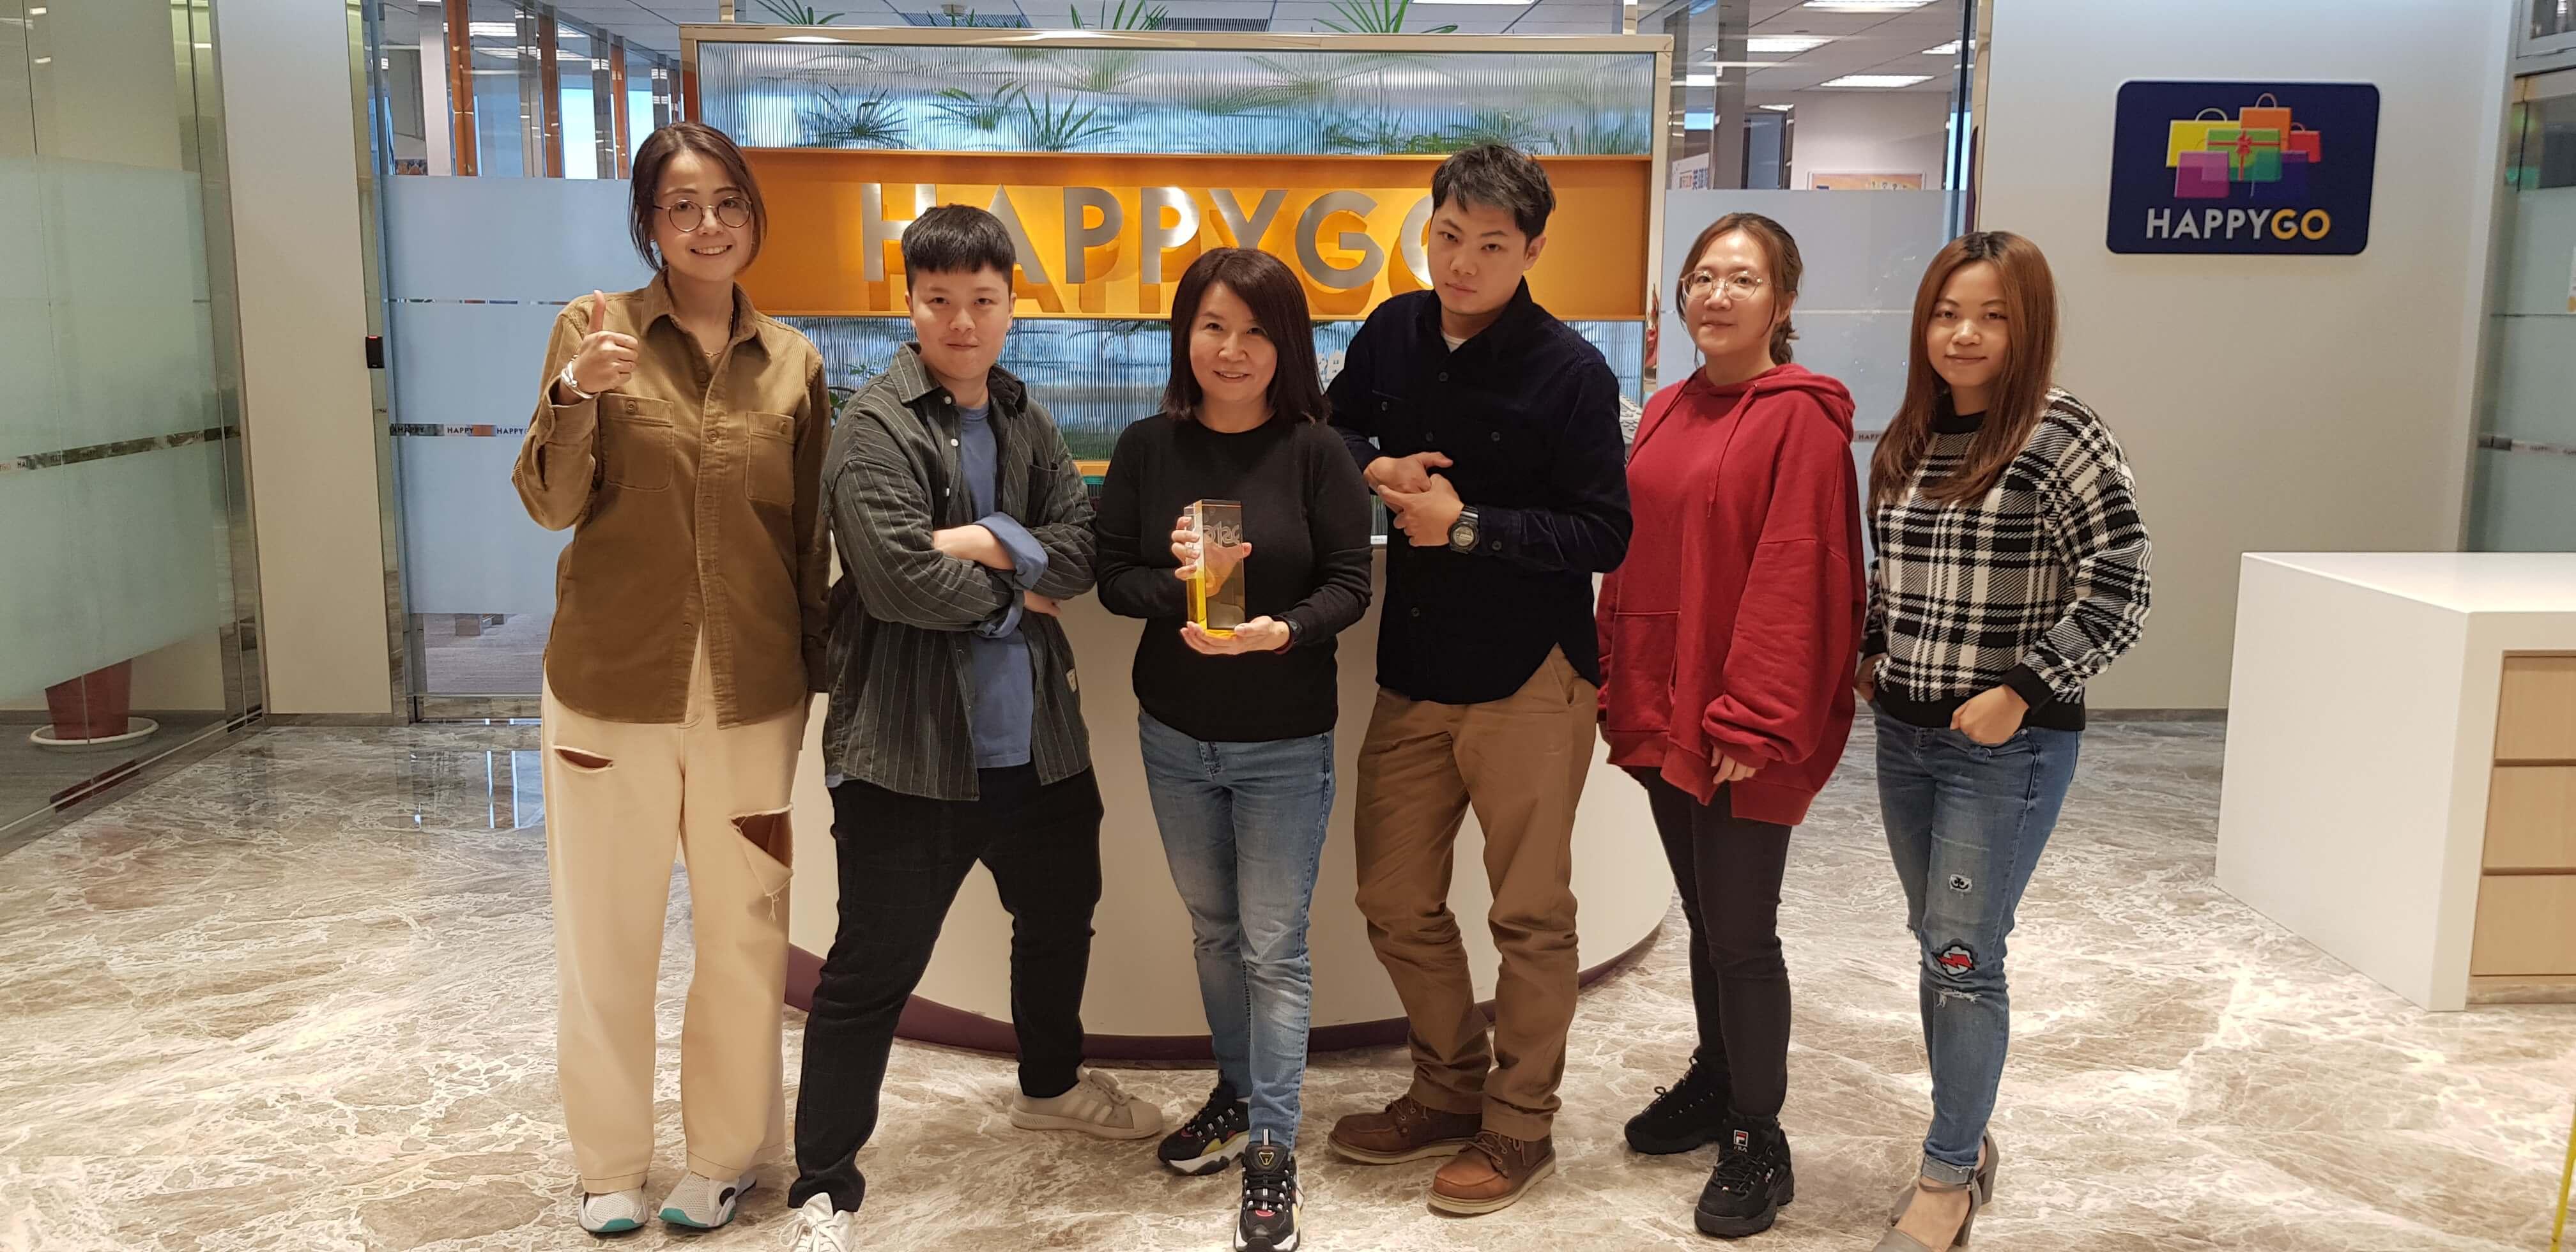 HAPPY GO雙獎殊榮 勇奪DMA年度最佳數據洞察創新獎